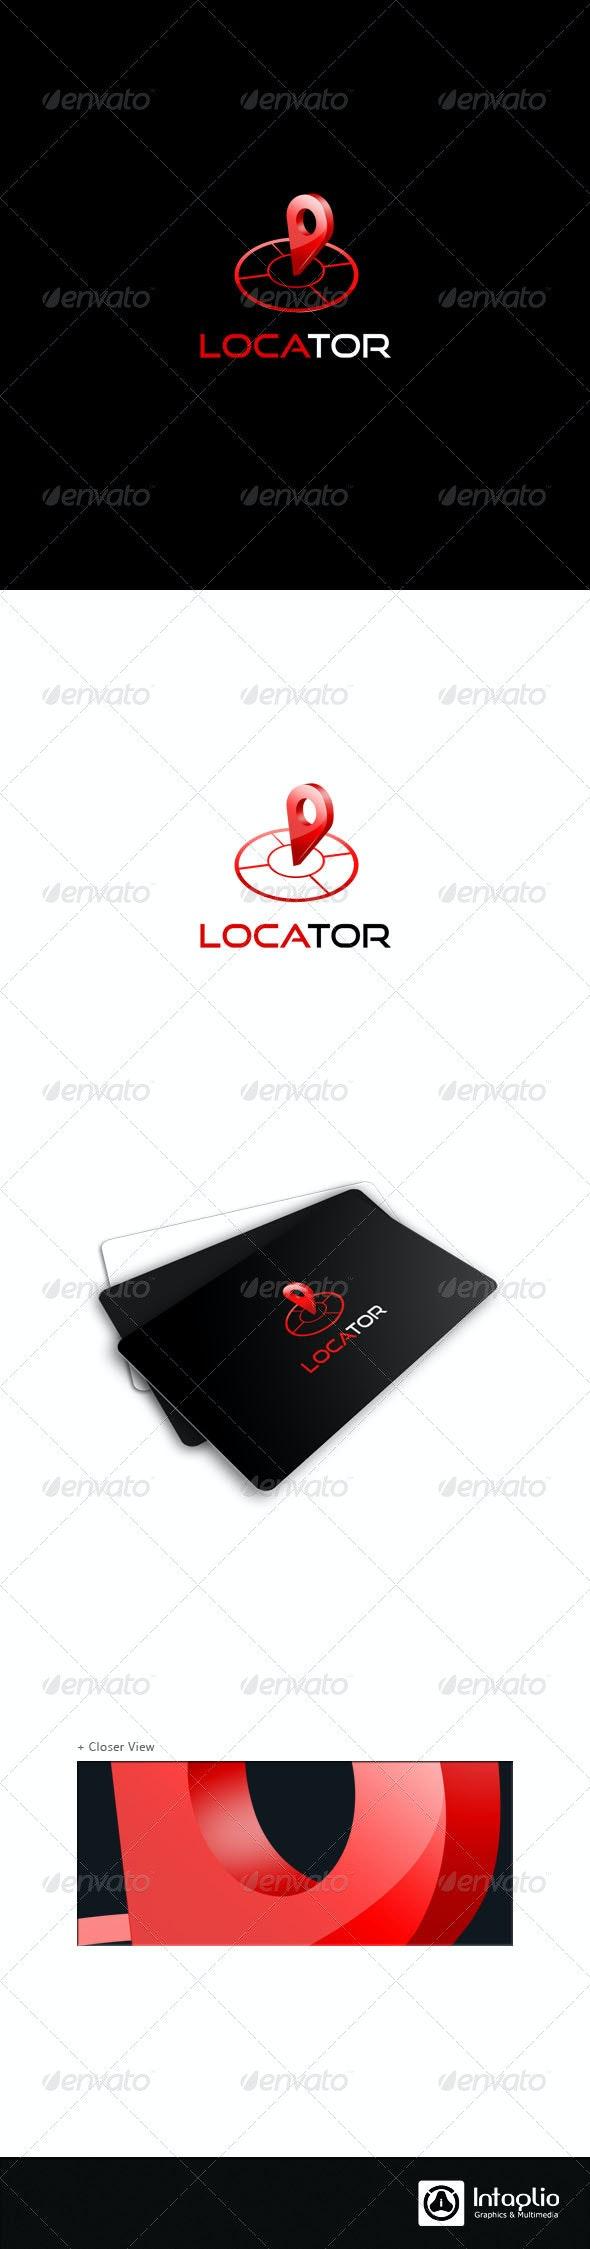 3D Navigation Logo Template - Locator - 3d Abstract